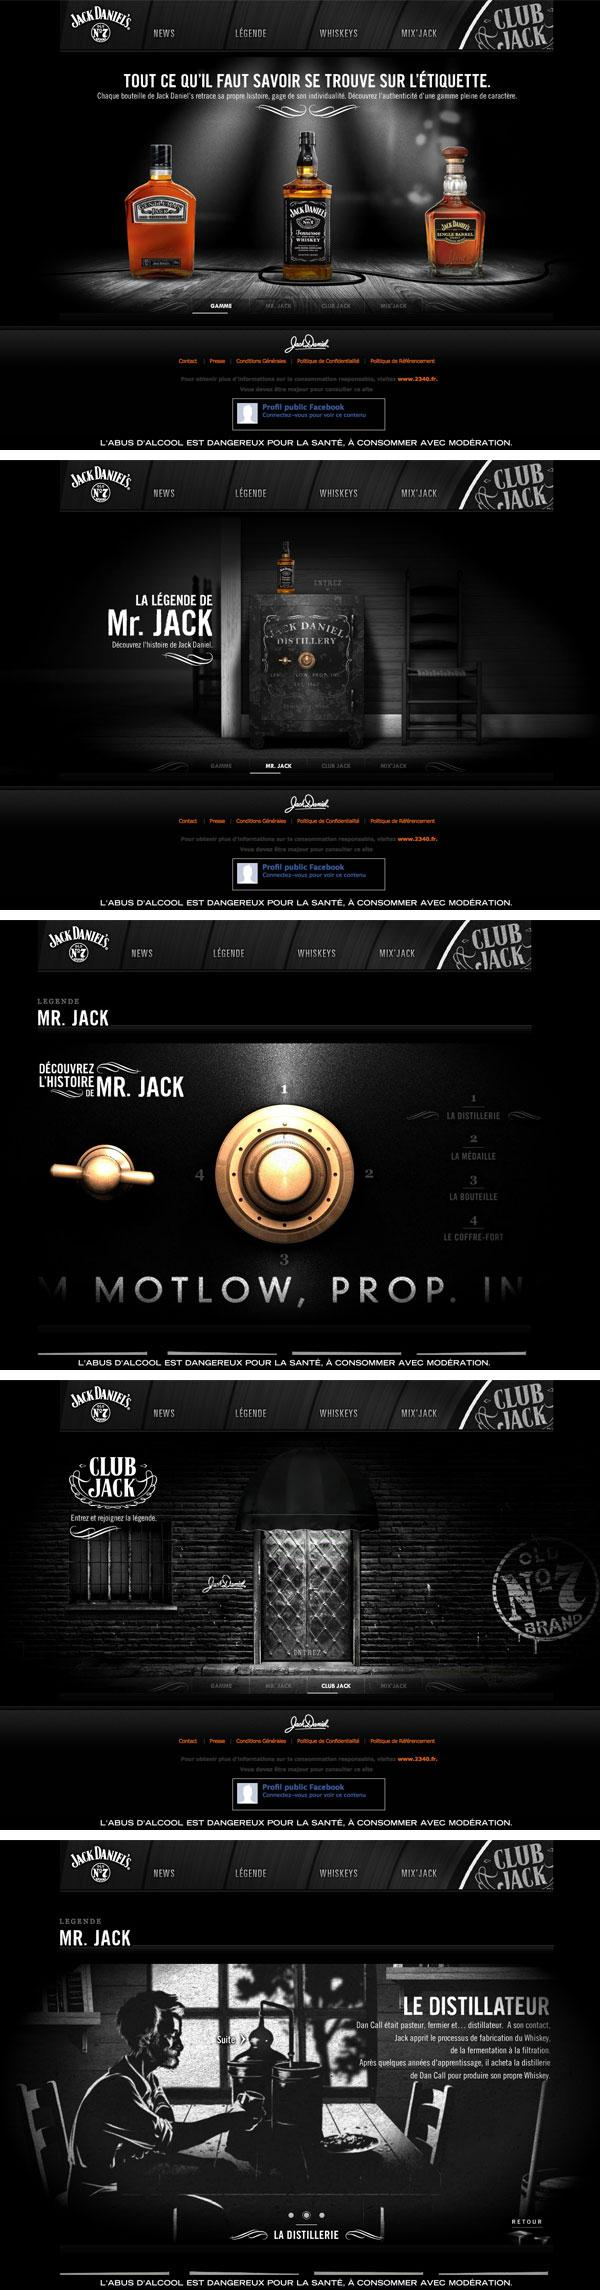 Jack Daniels | MRG LAB BLOG creative experience